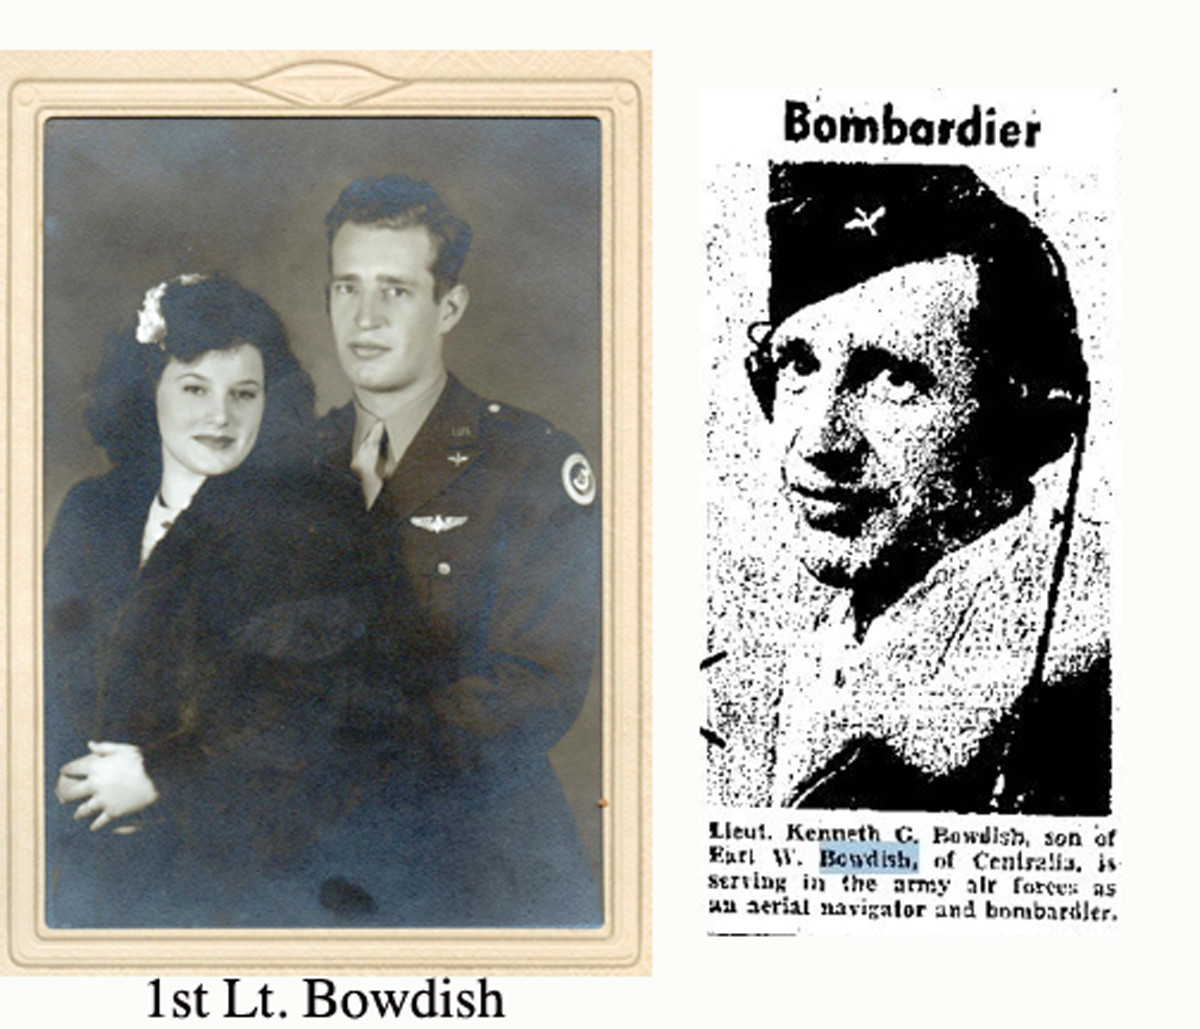 1st Lt. Bowdish